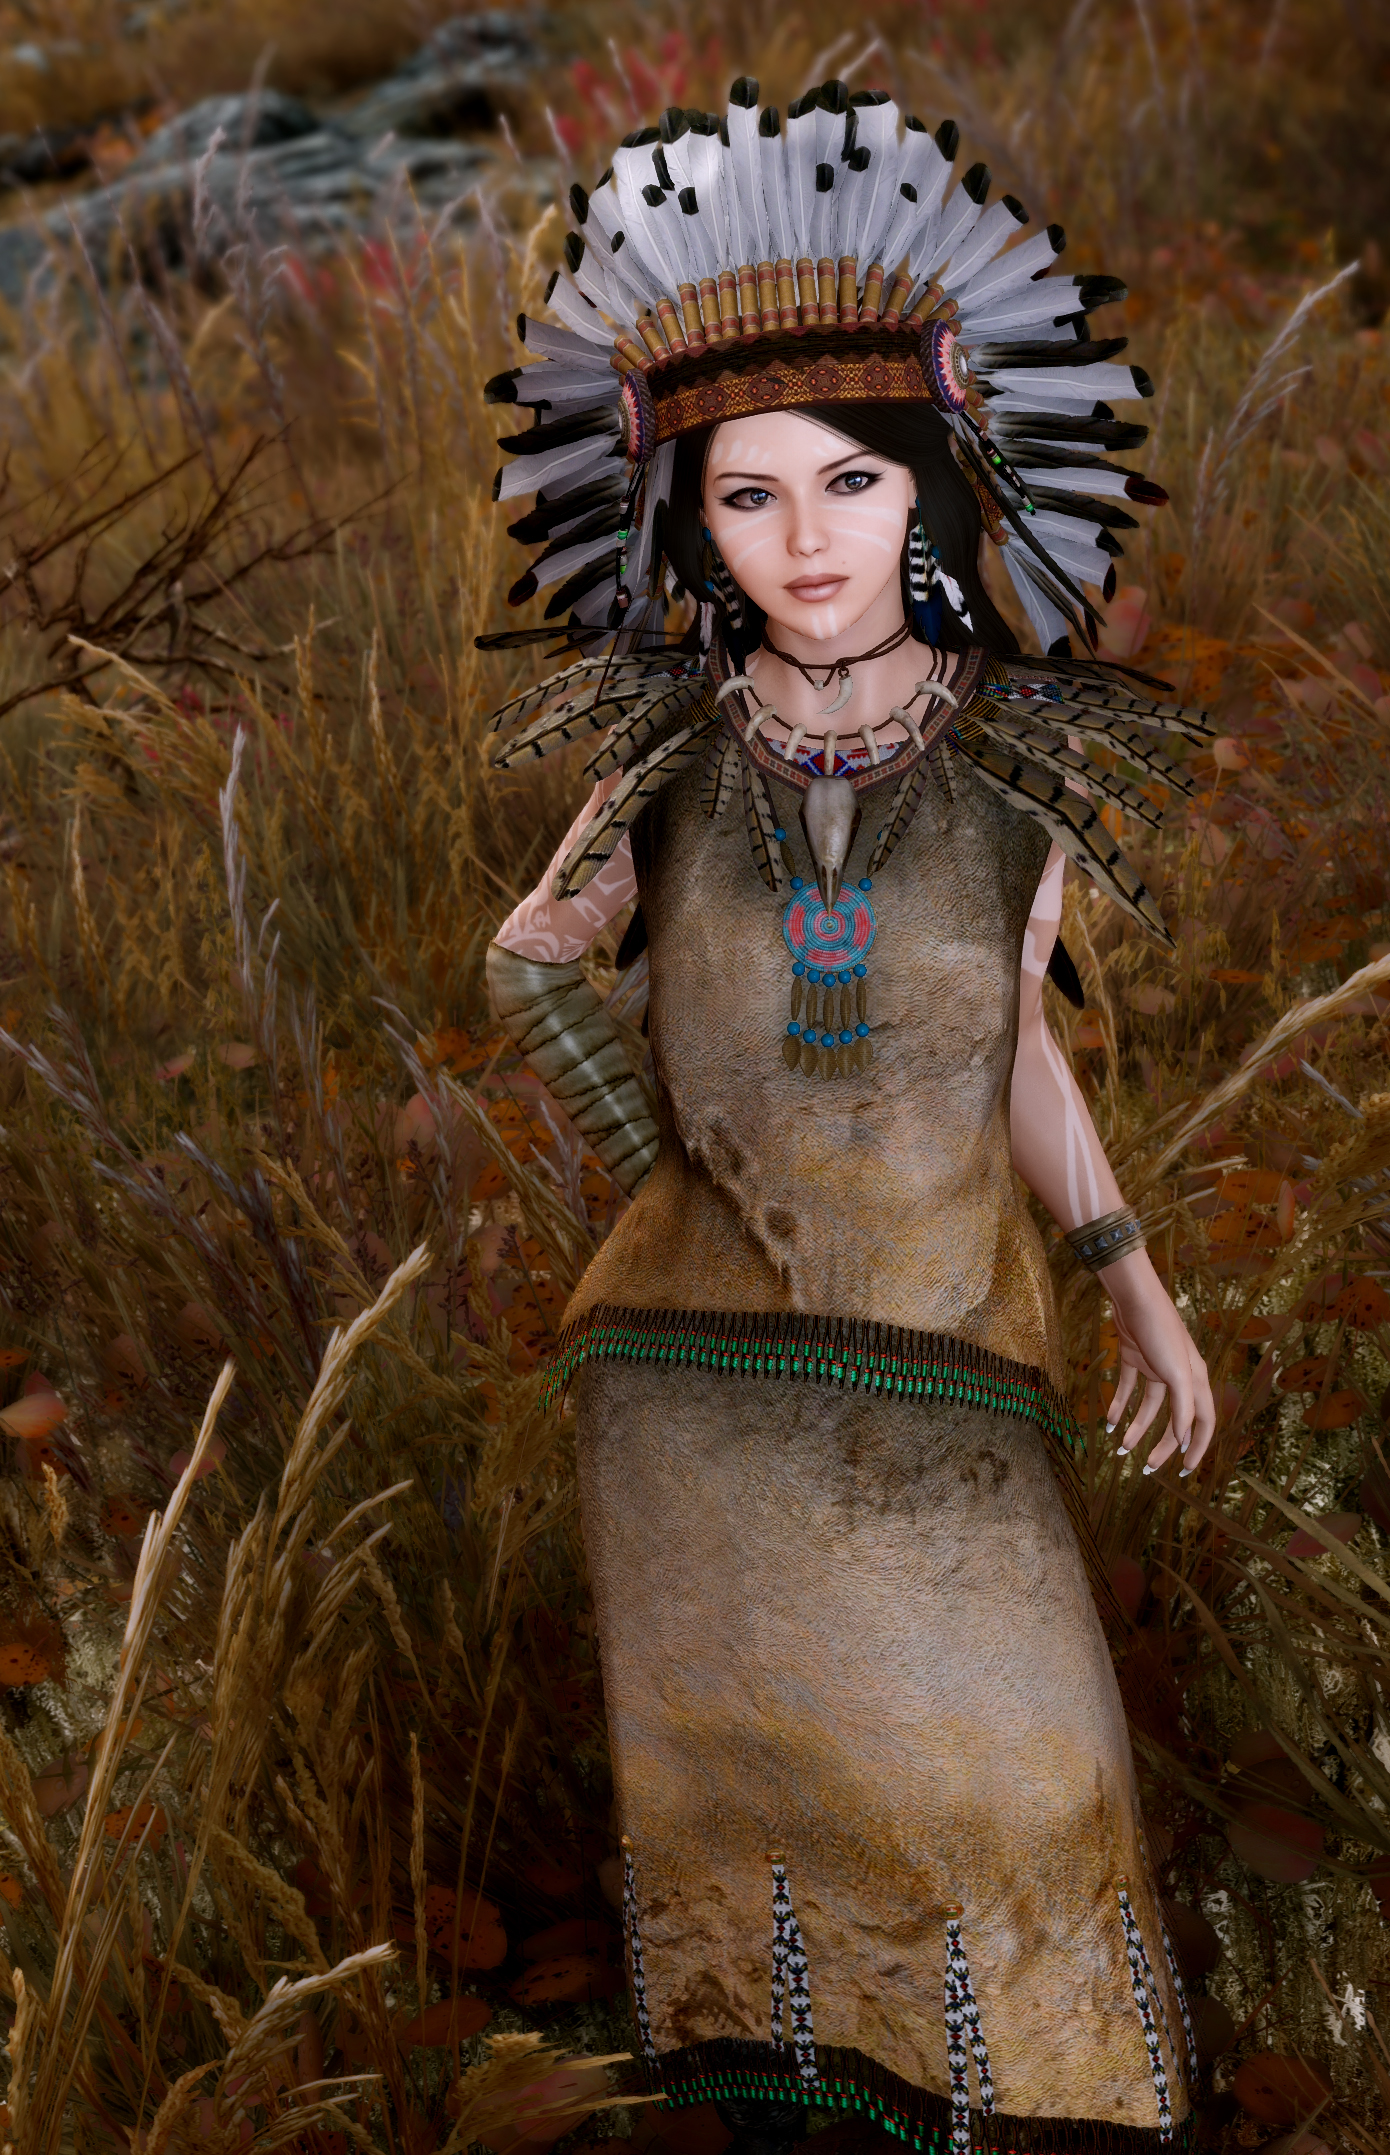 22249248123_07f7a1d50d_o.jpg - Elder Scrolls 5: Skyrim, the